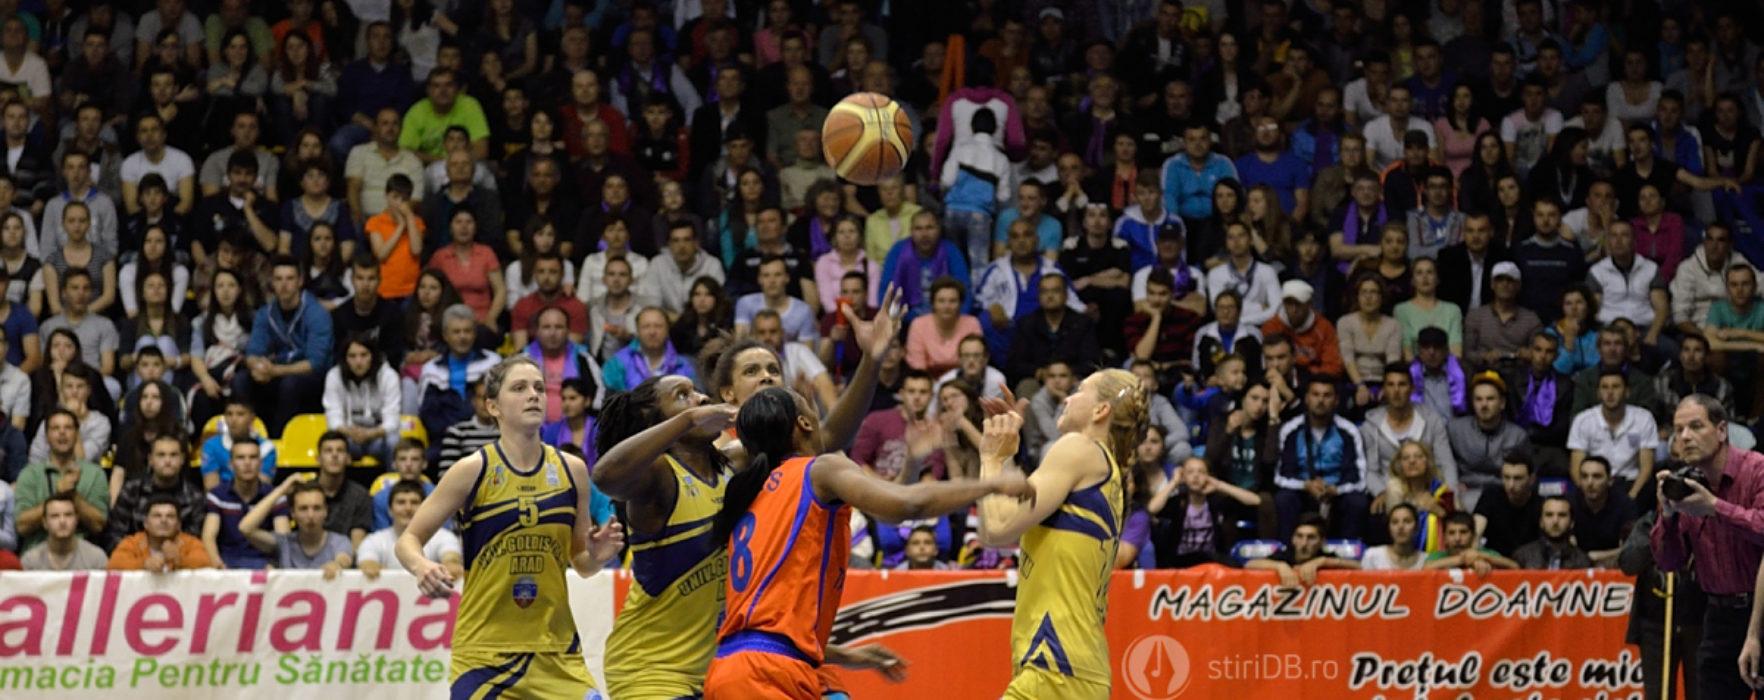 Baschet feminin: CSM Târgovişte câştigă clar Supercupa României